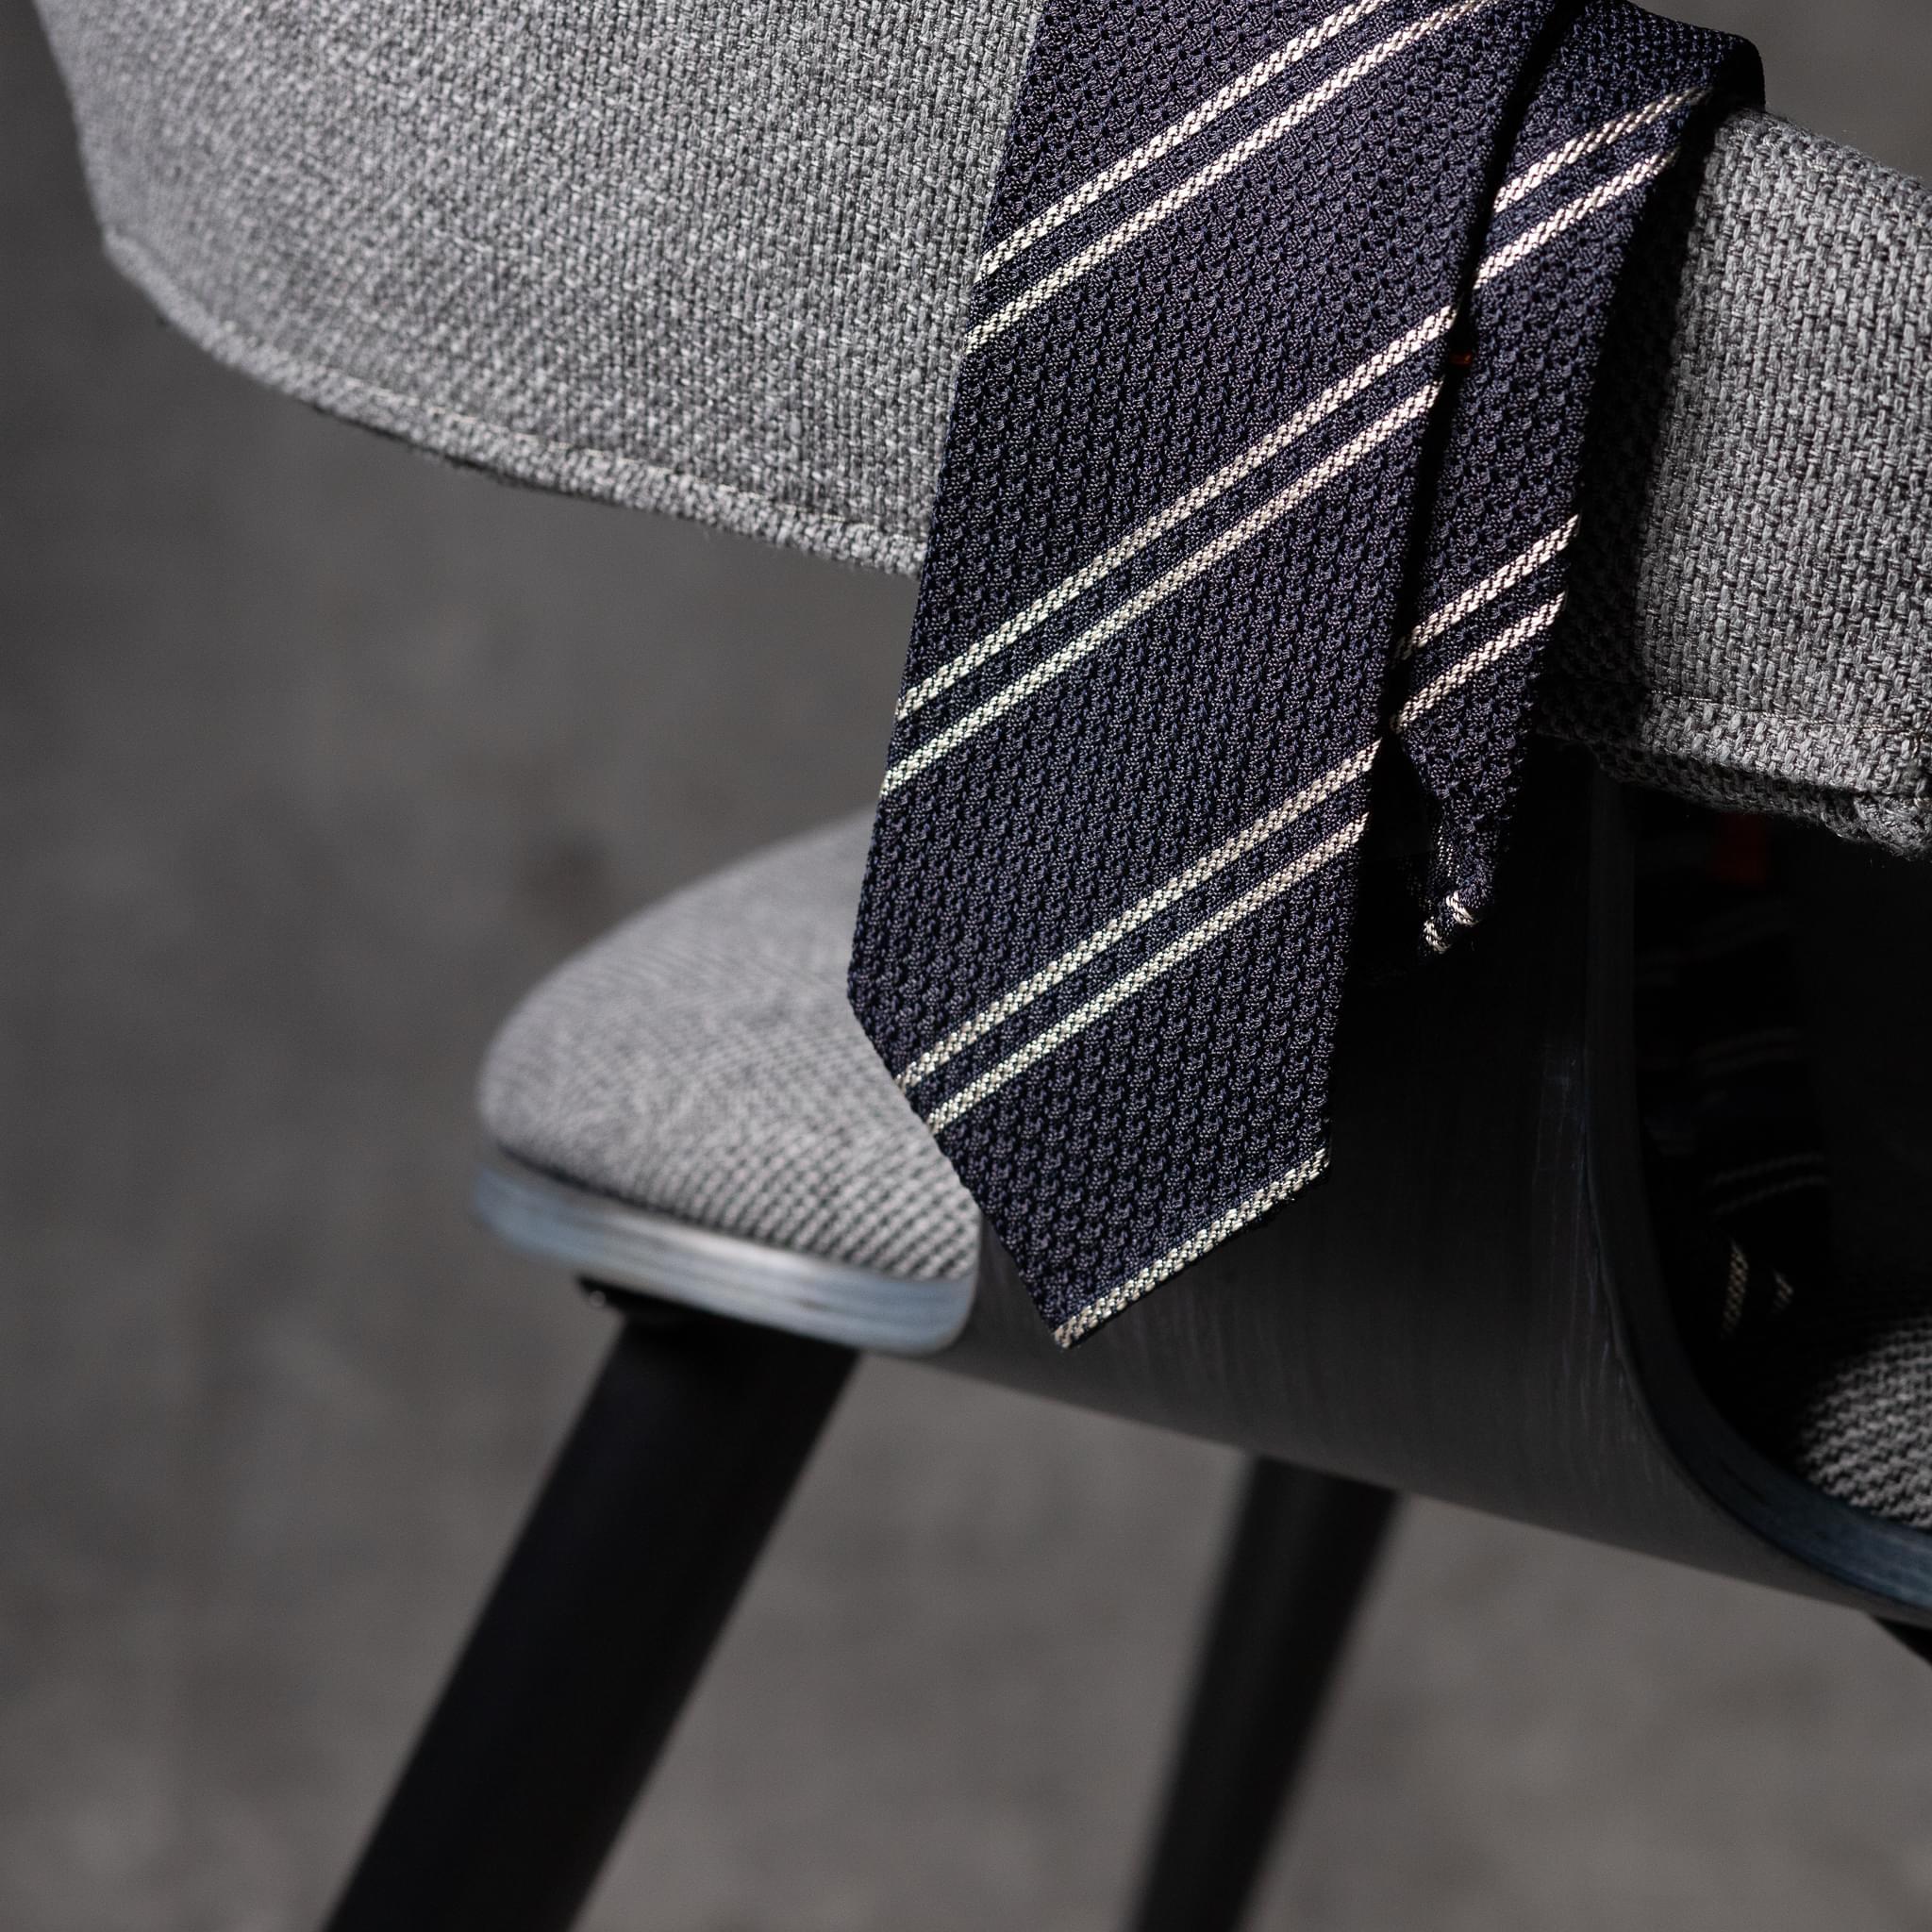 GRENADINE-0442-Tie-Initials-Corbata-Iniciales-The-Seelk-2